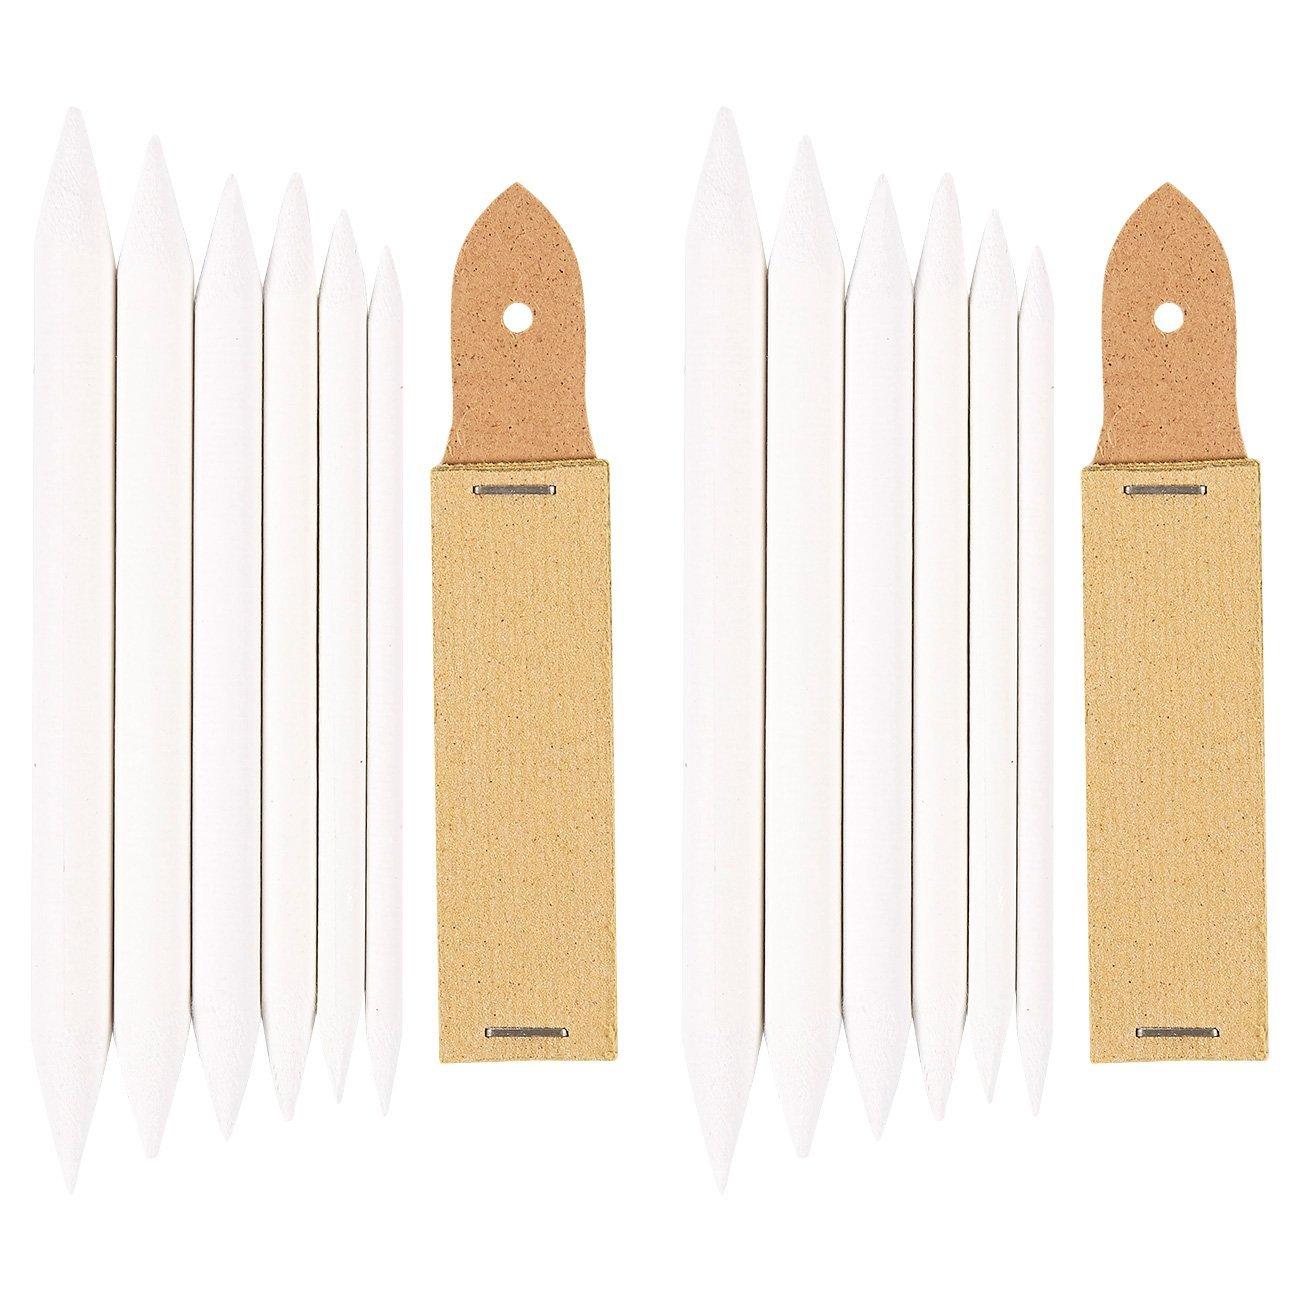 цена Blending Stump, and Sharpener 12 Piece Blending Stumps and Tortillions, and 2 Sandpaper Sharpeners, Blends and Sharpens,